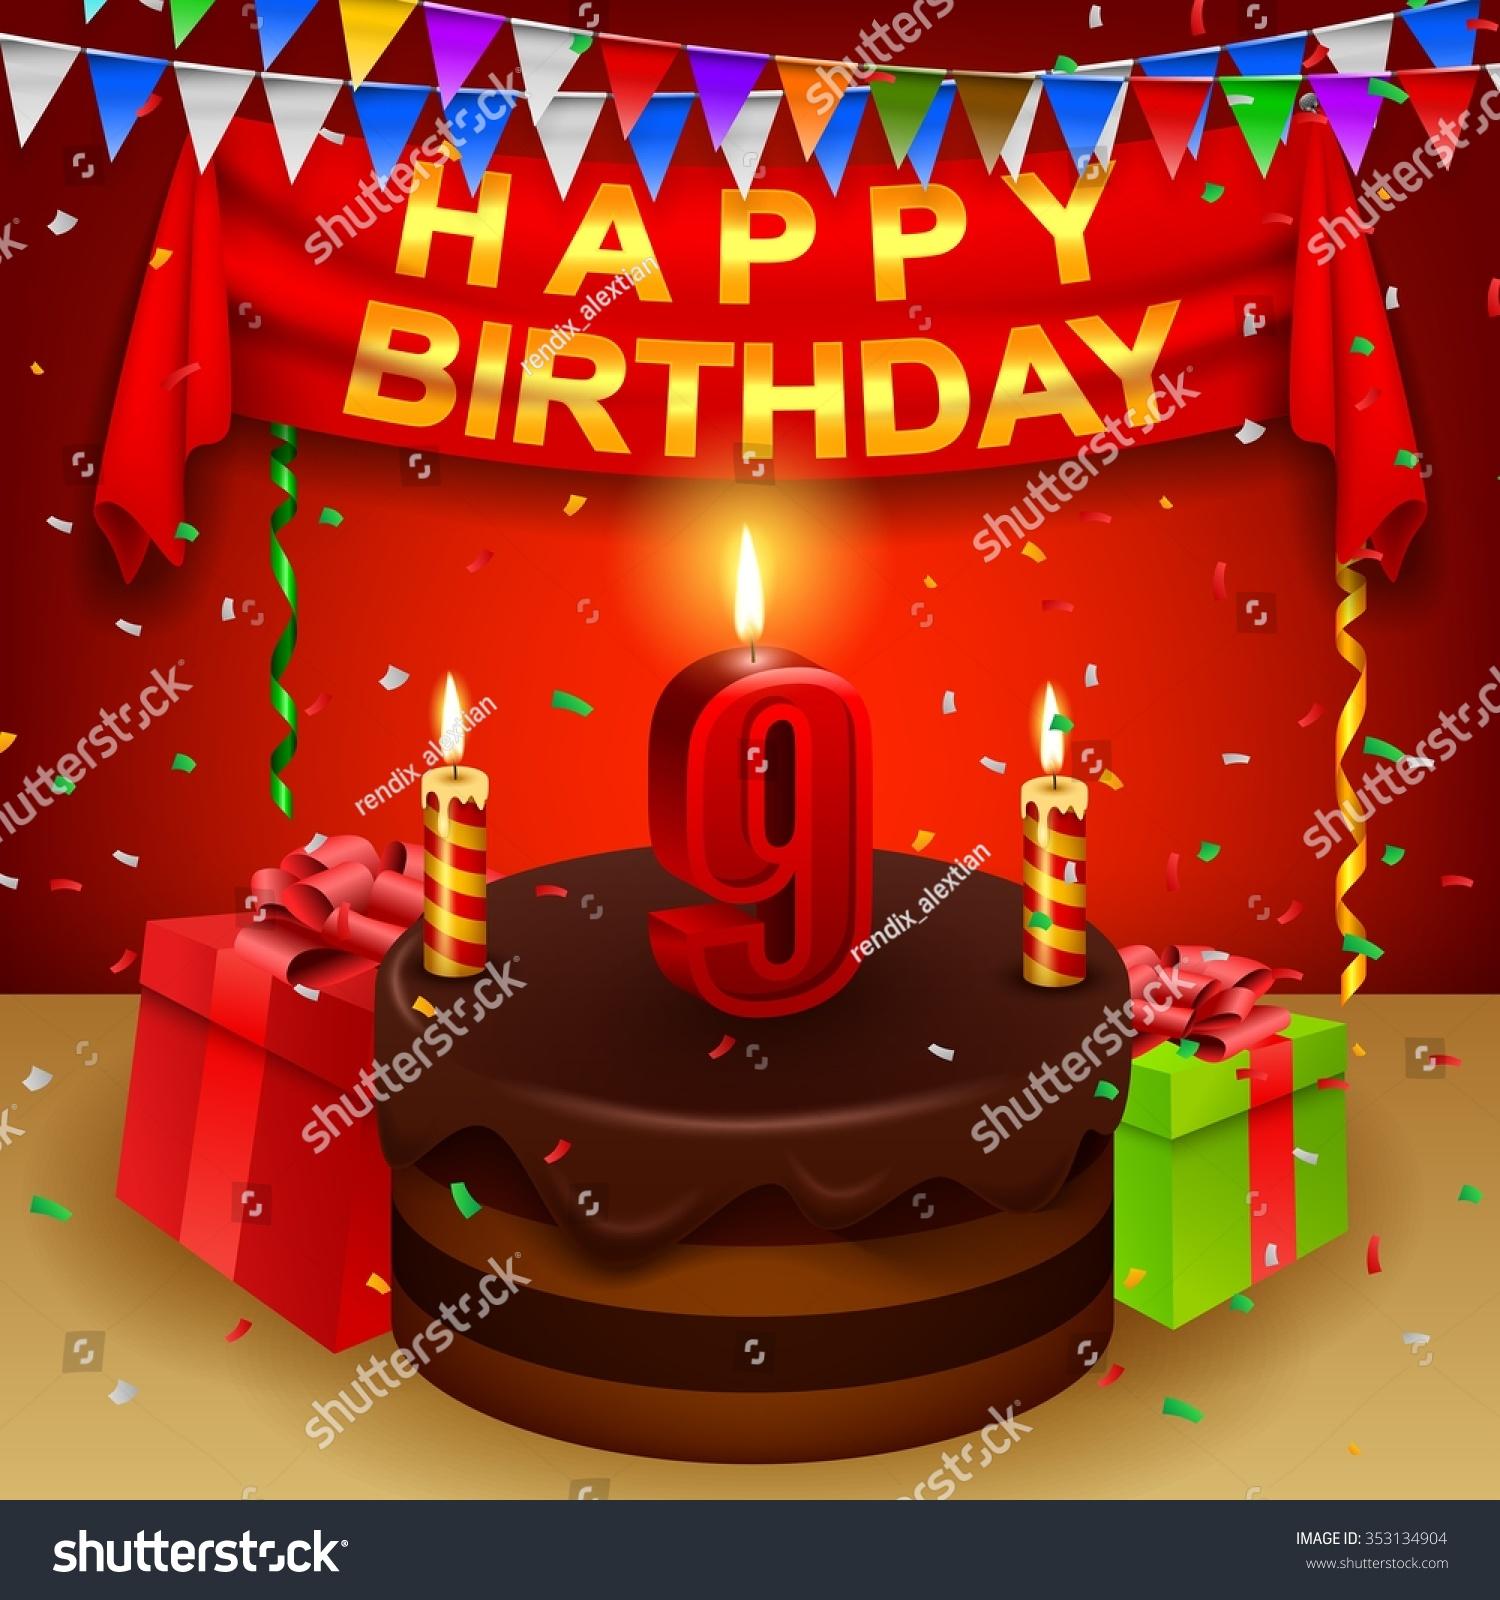 Bildquelle Plusoneshutterstockcom: 9th Birthday Images